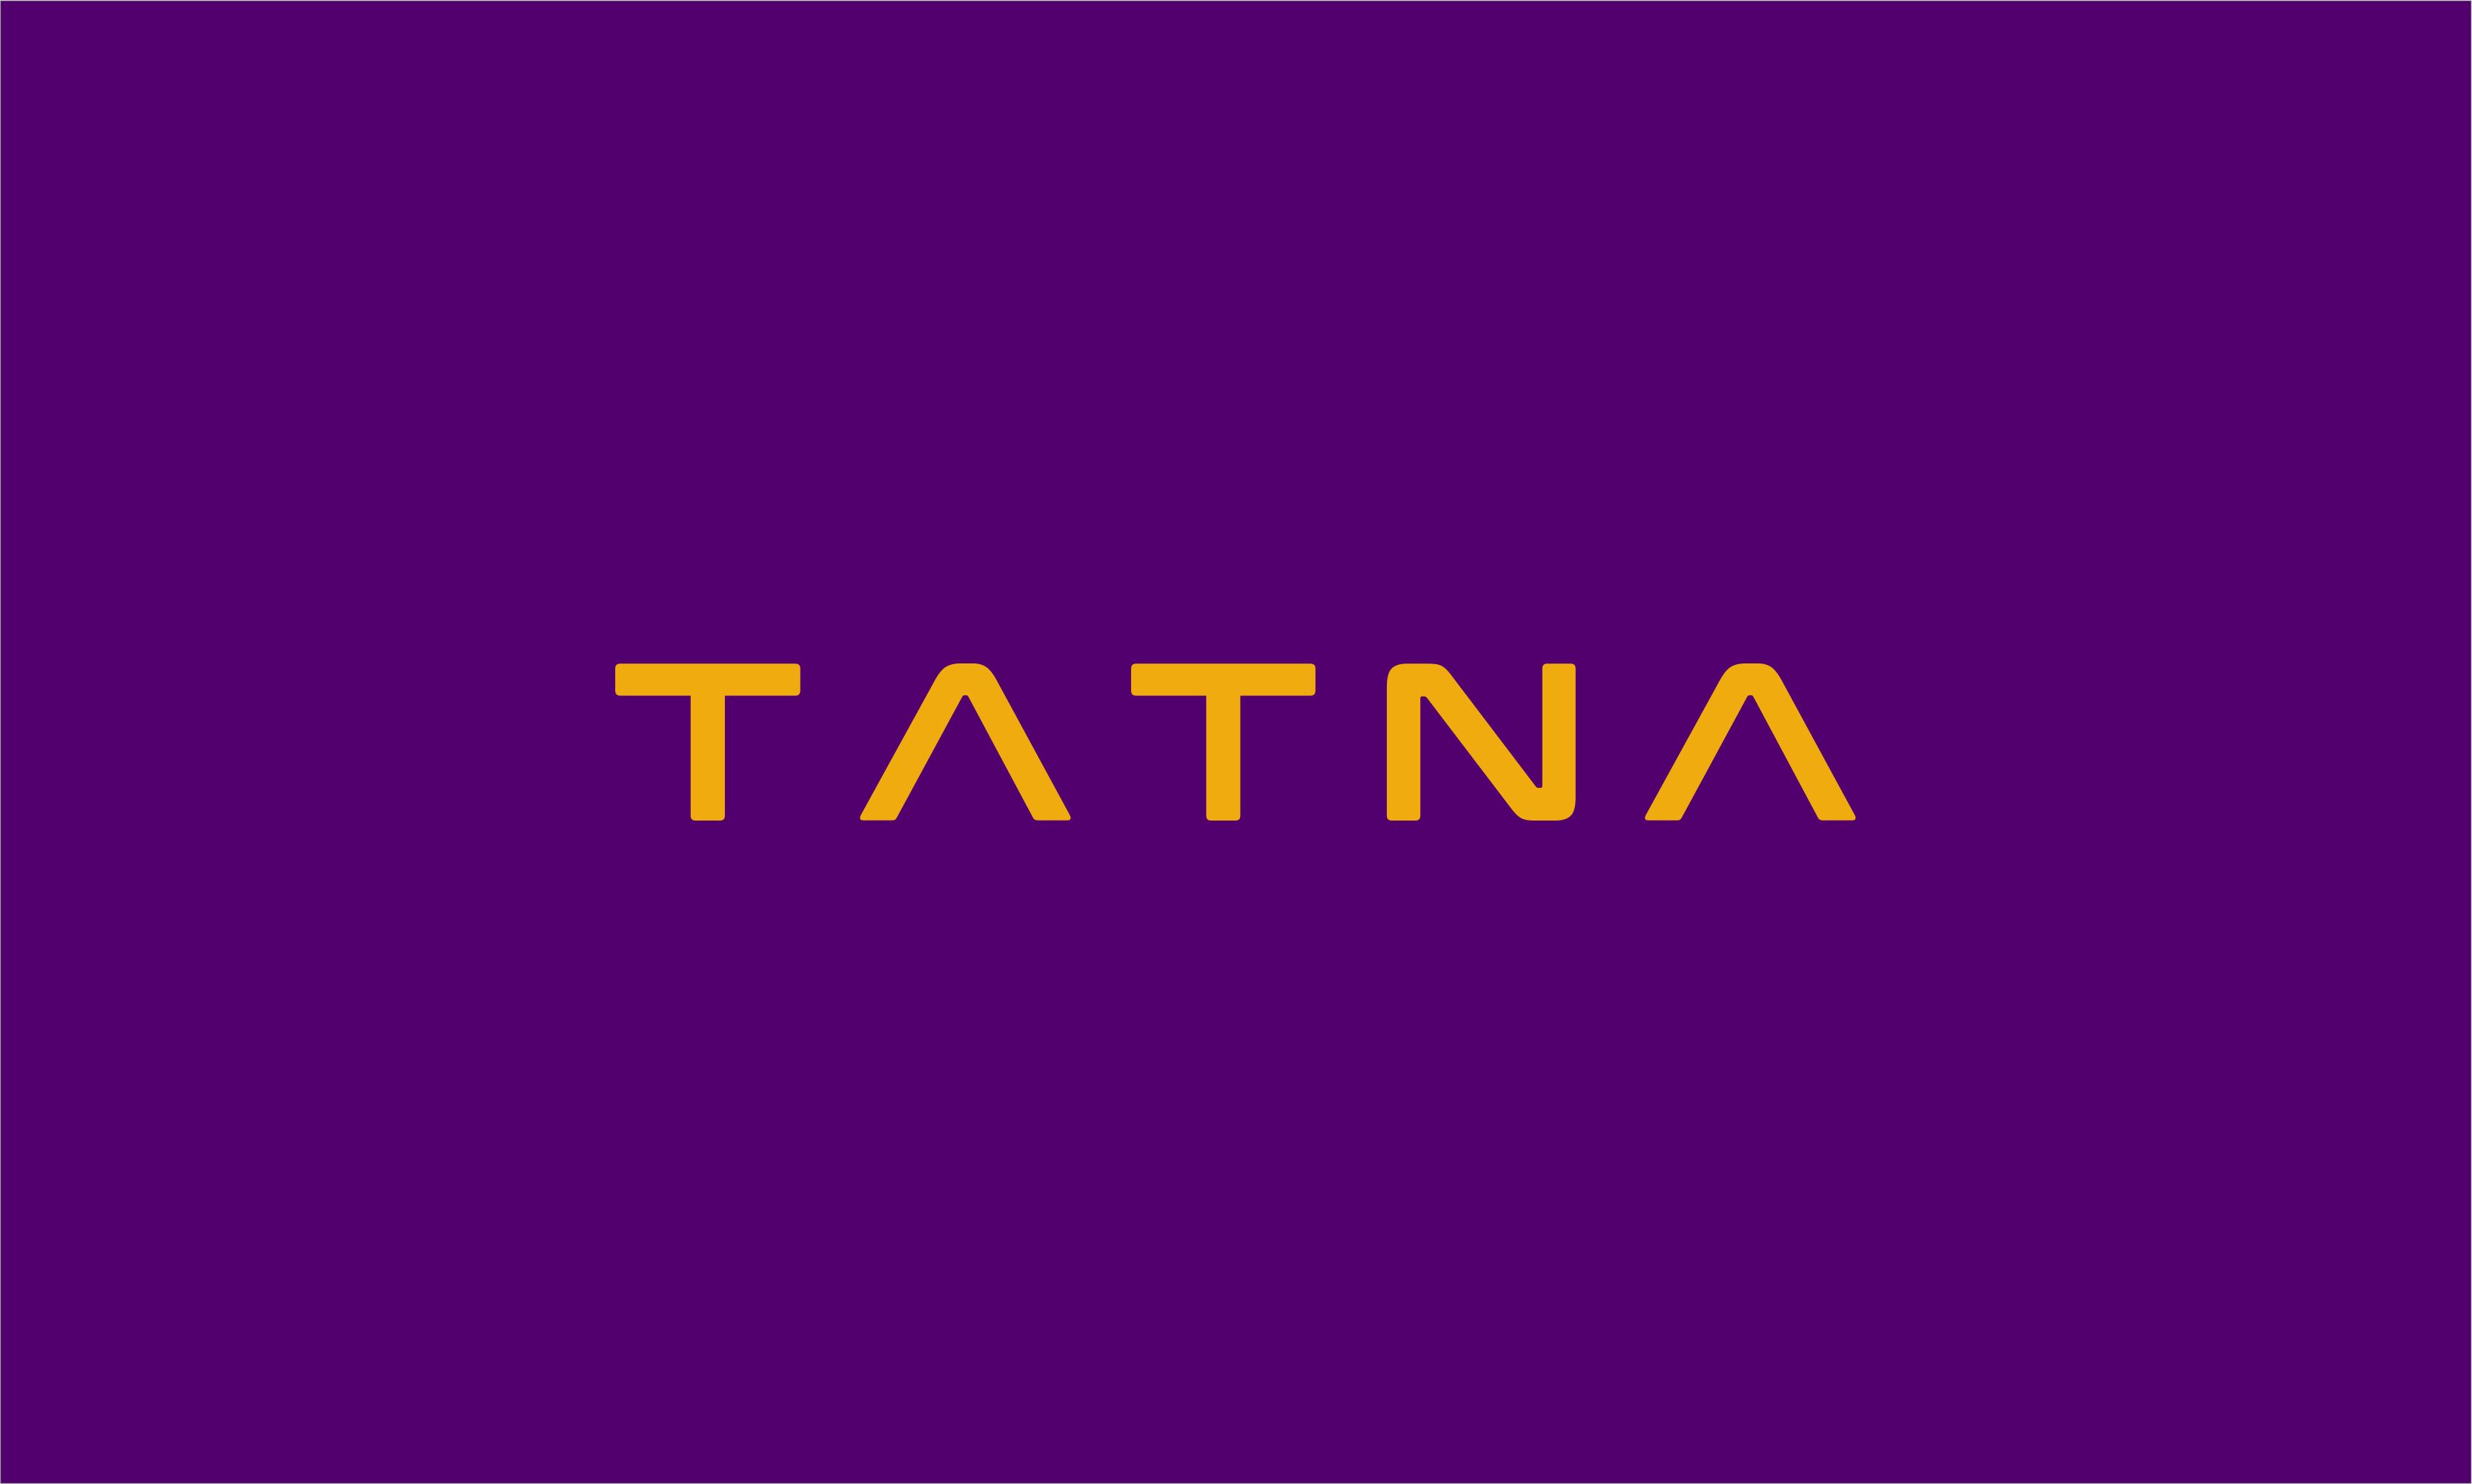 Tatna